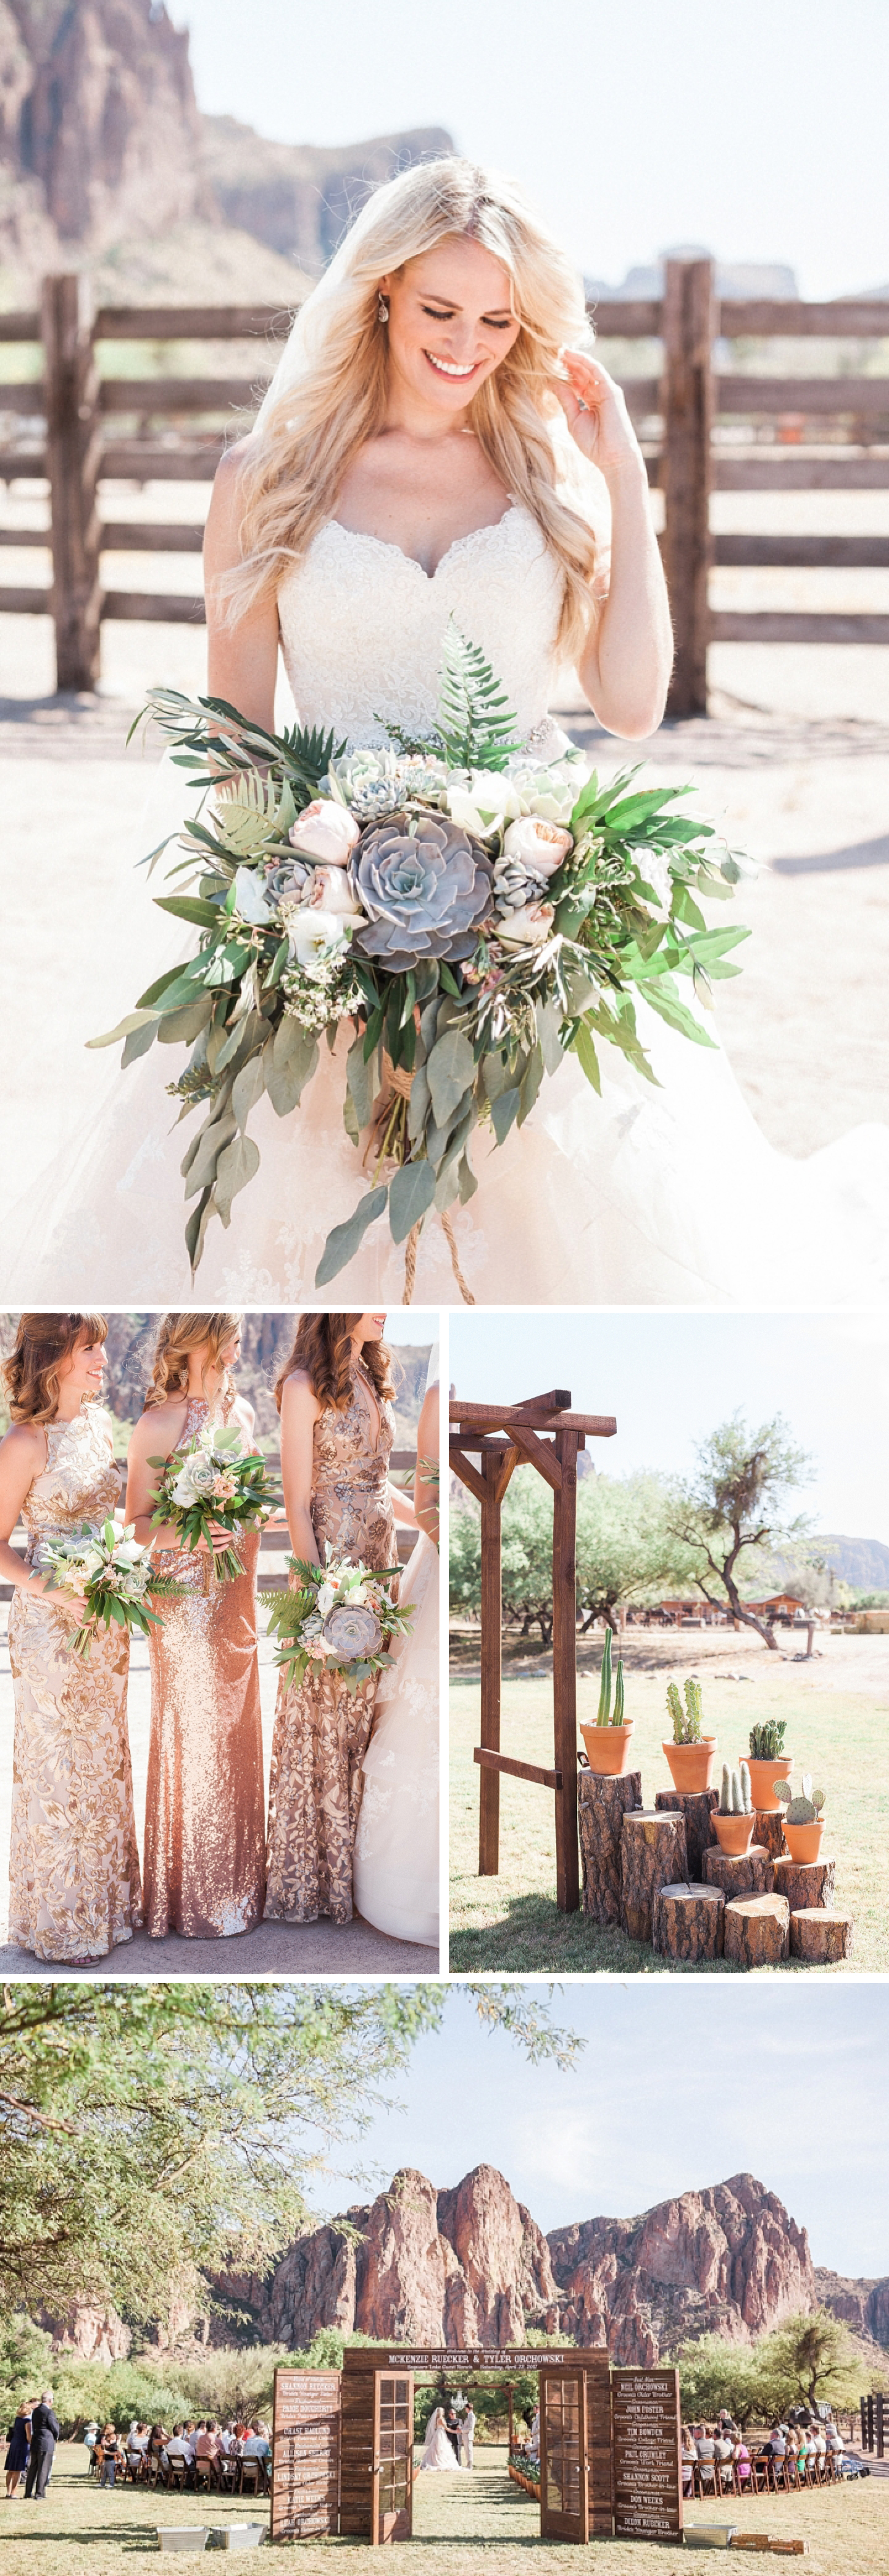 Tyler & McKenzie's Rose Gold Desert Mountain Wedding